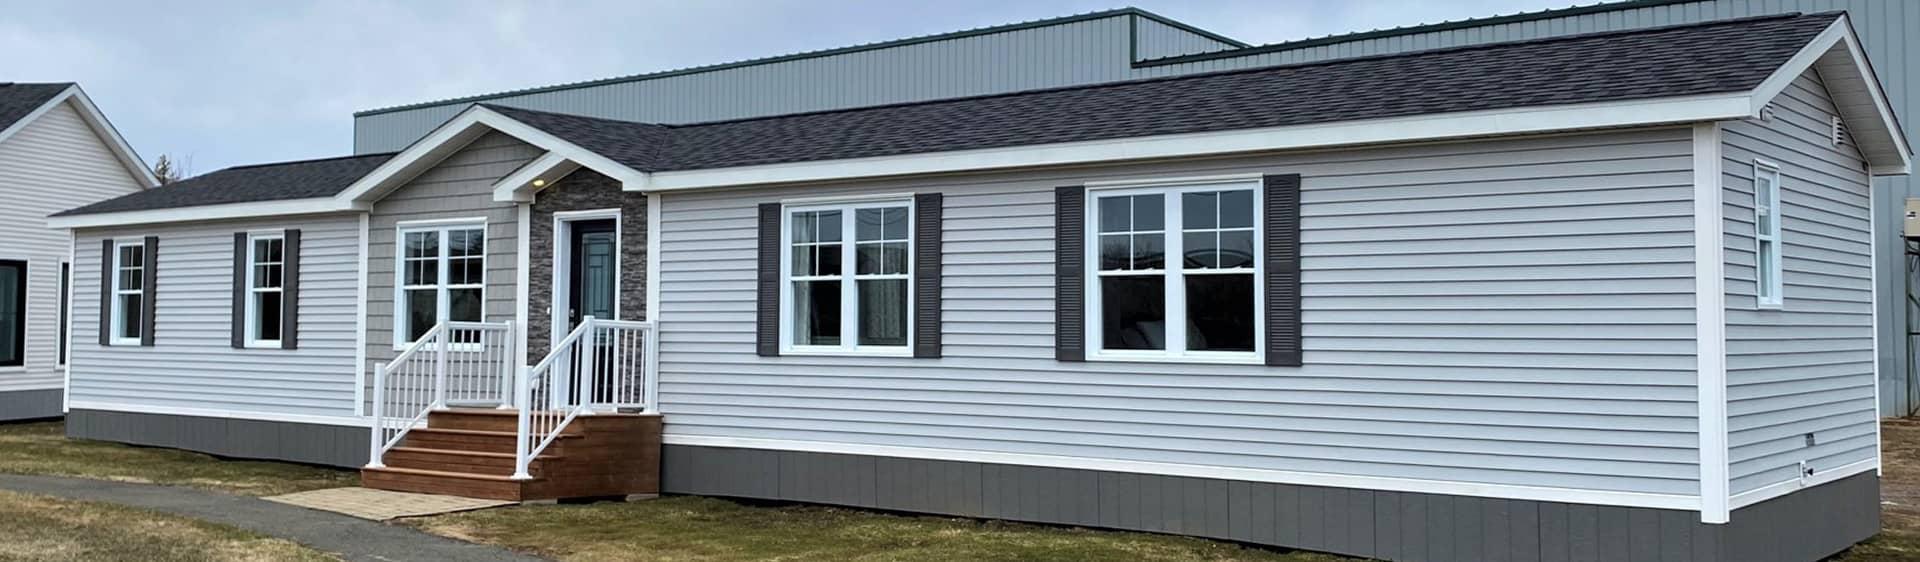 Deer Lake Mini Home Builder, Mini Home Financing and Home Mortgages